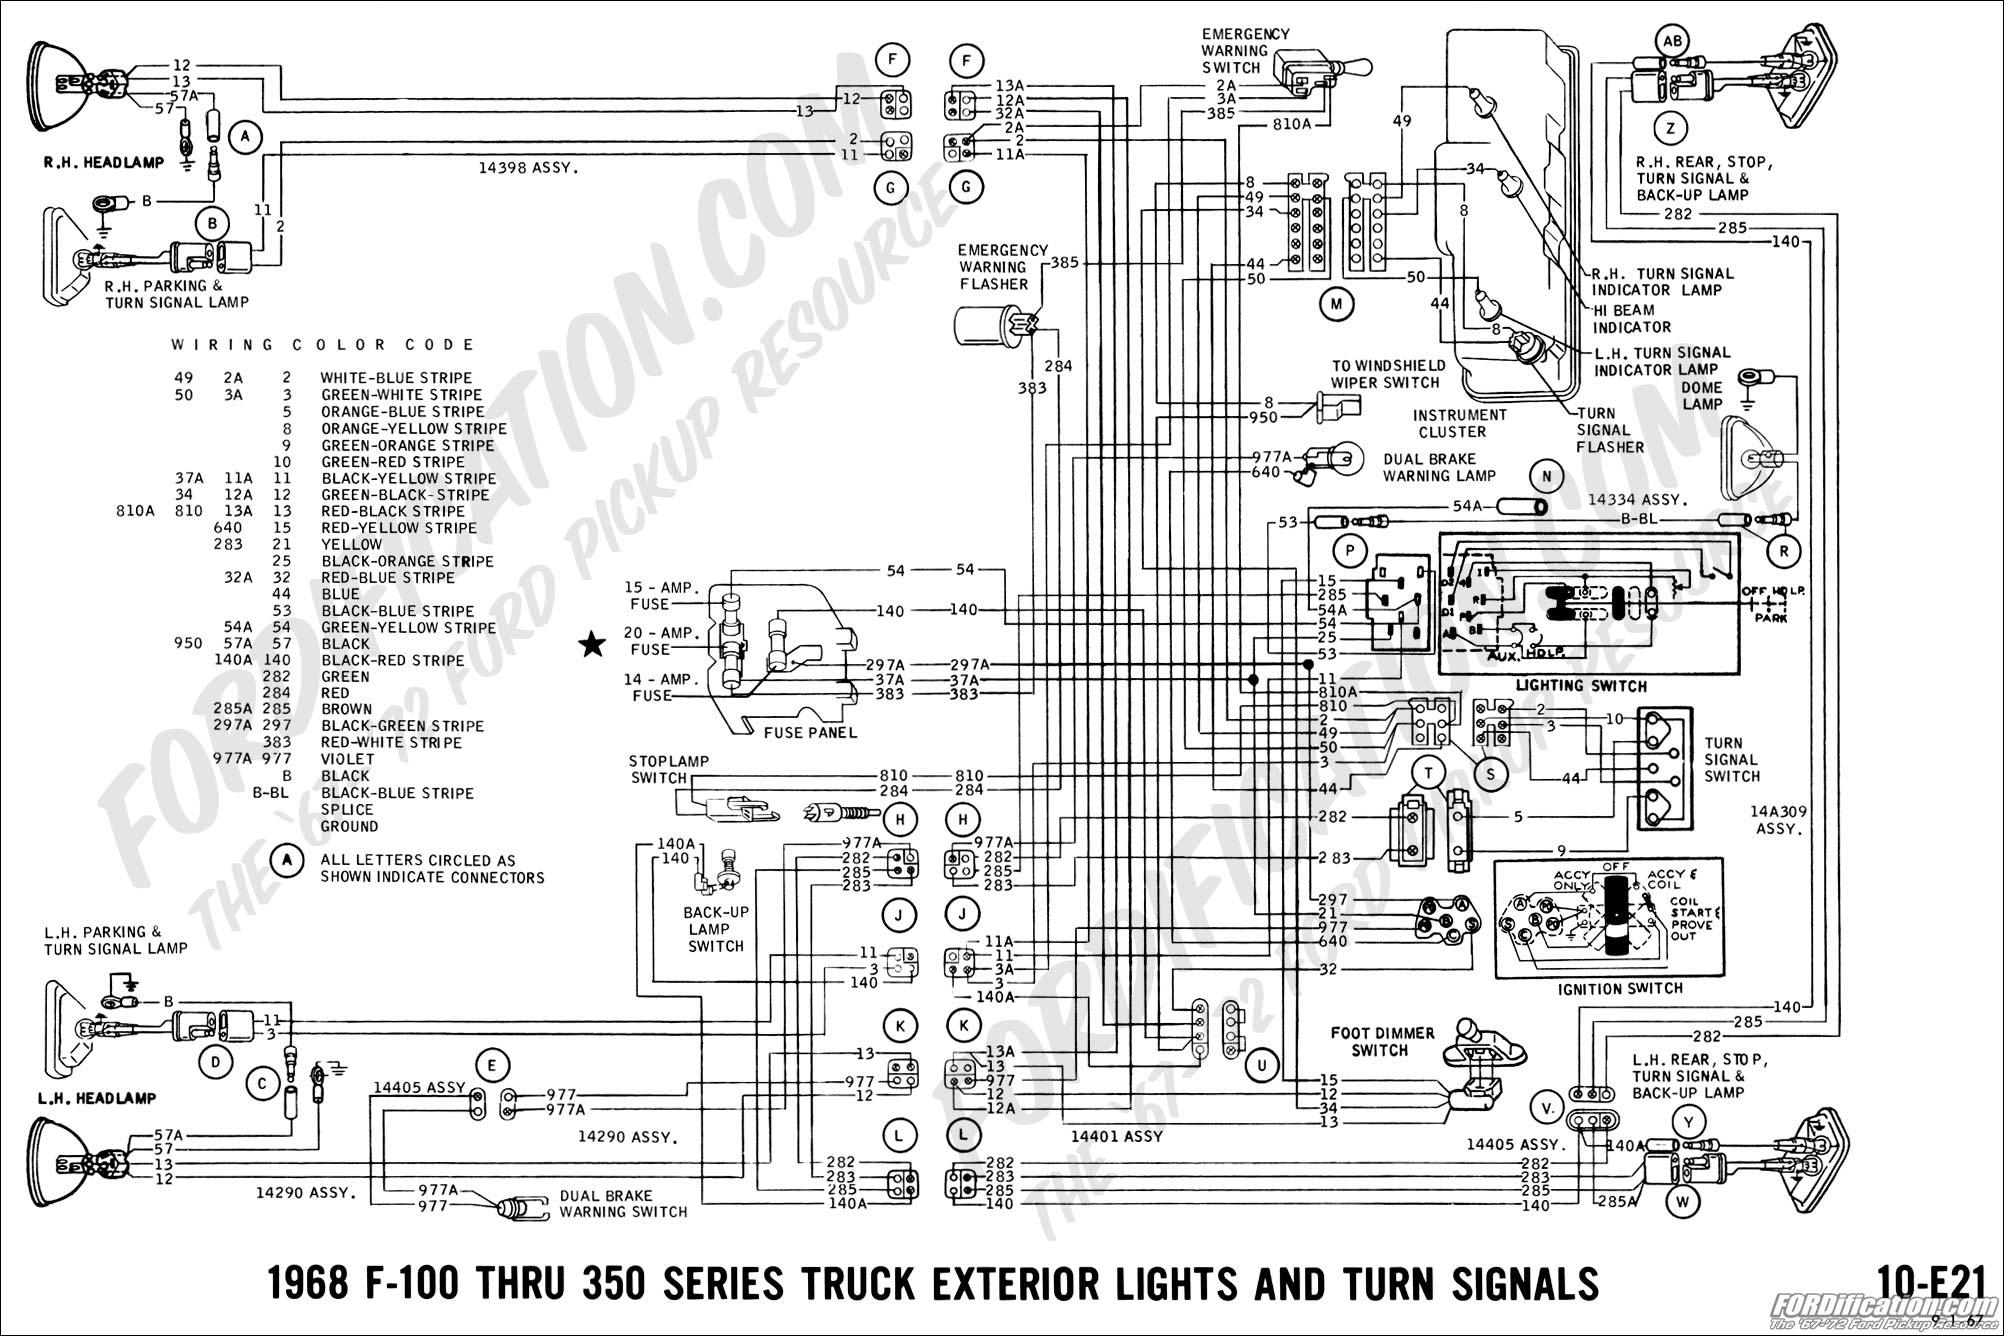 1970 plymouth fury wiring diagram